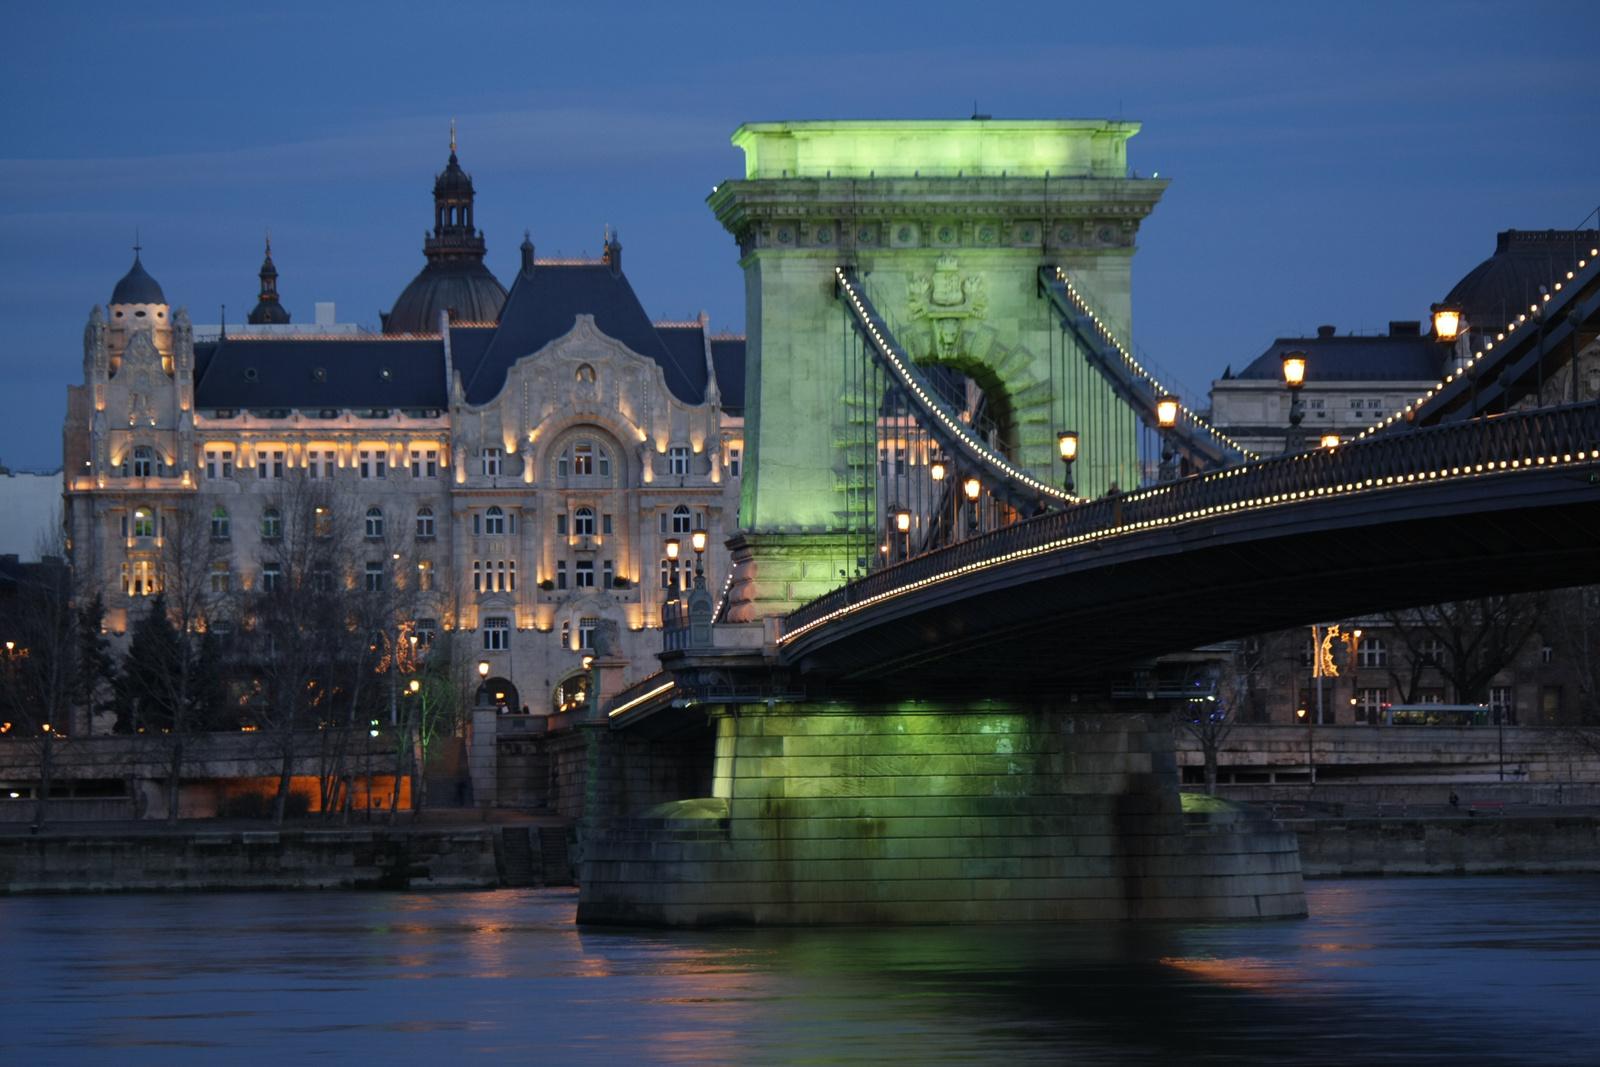 Híd a Greshambe - balról